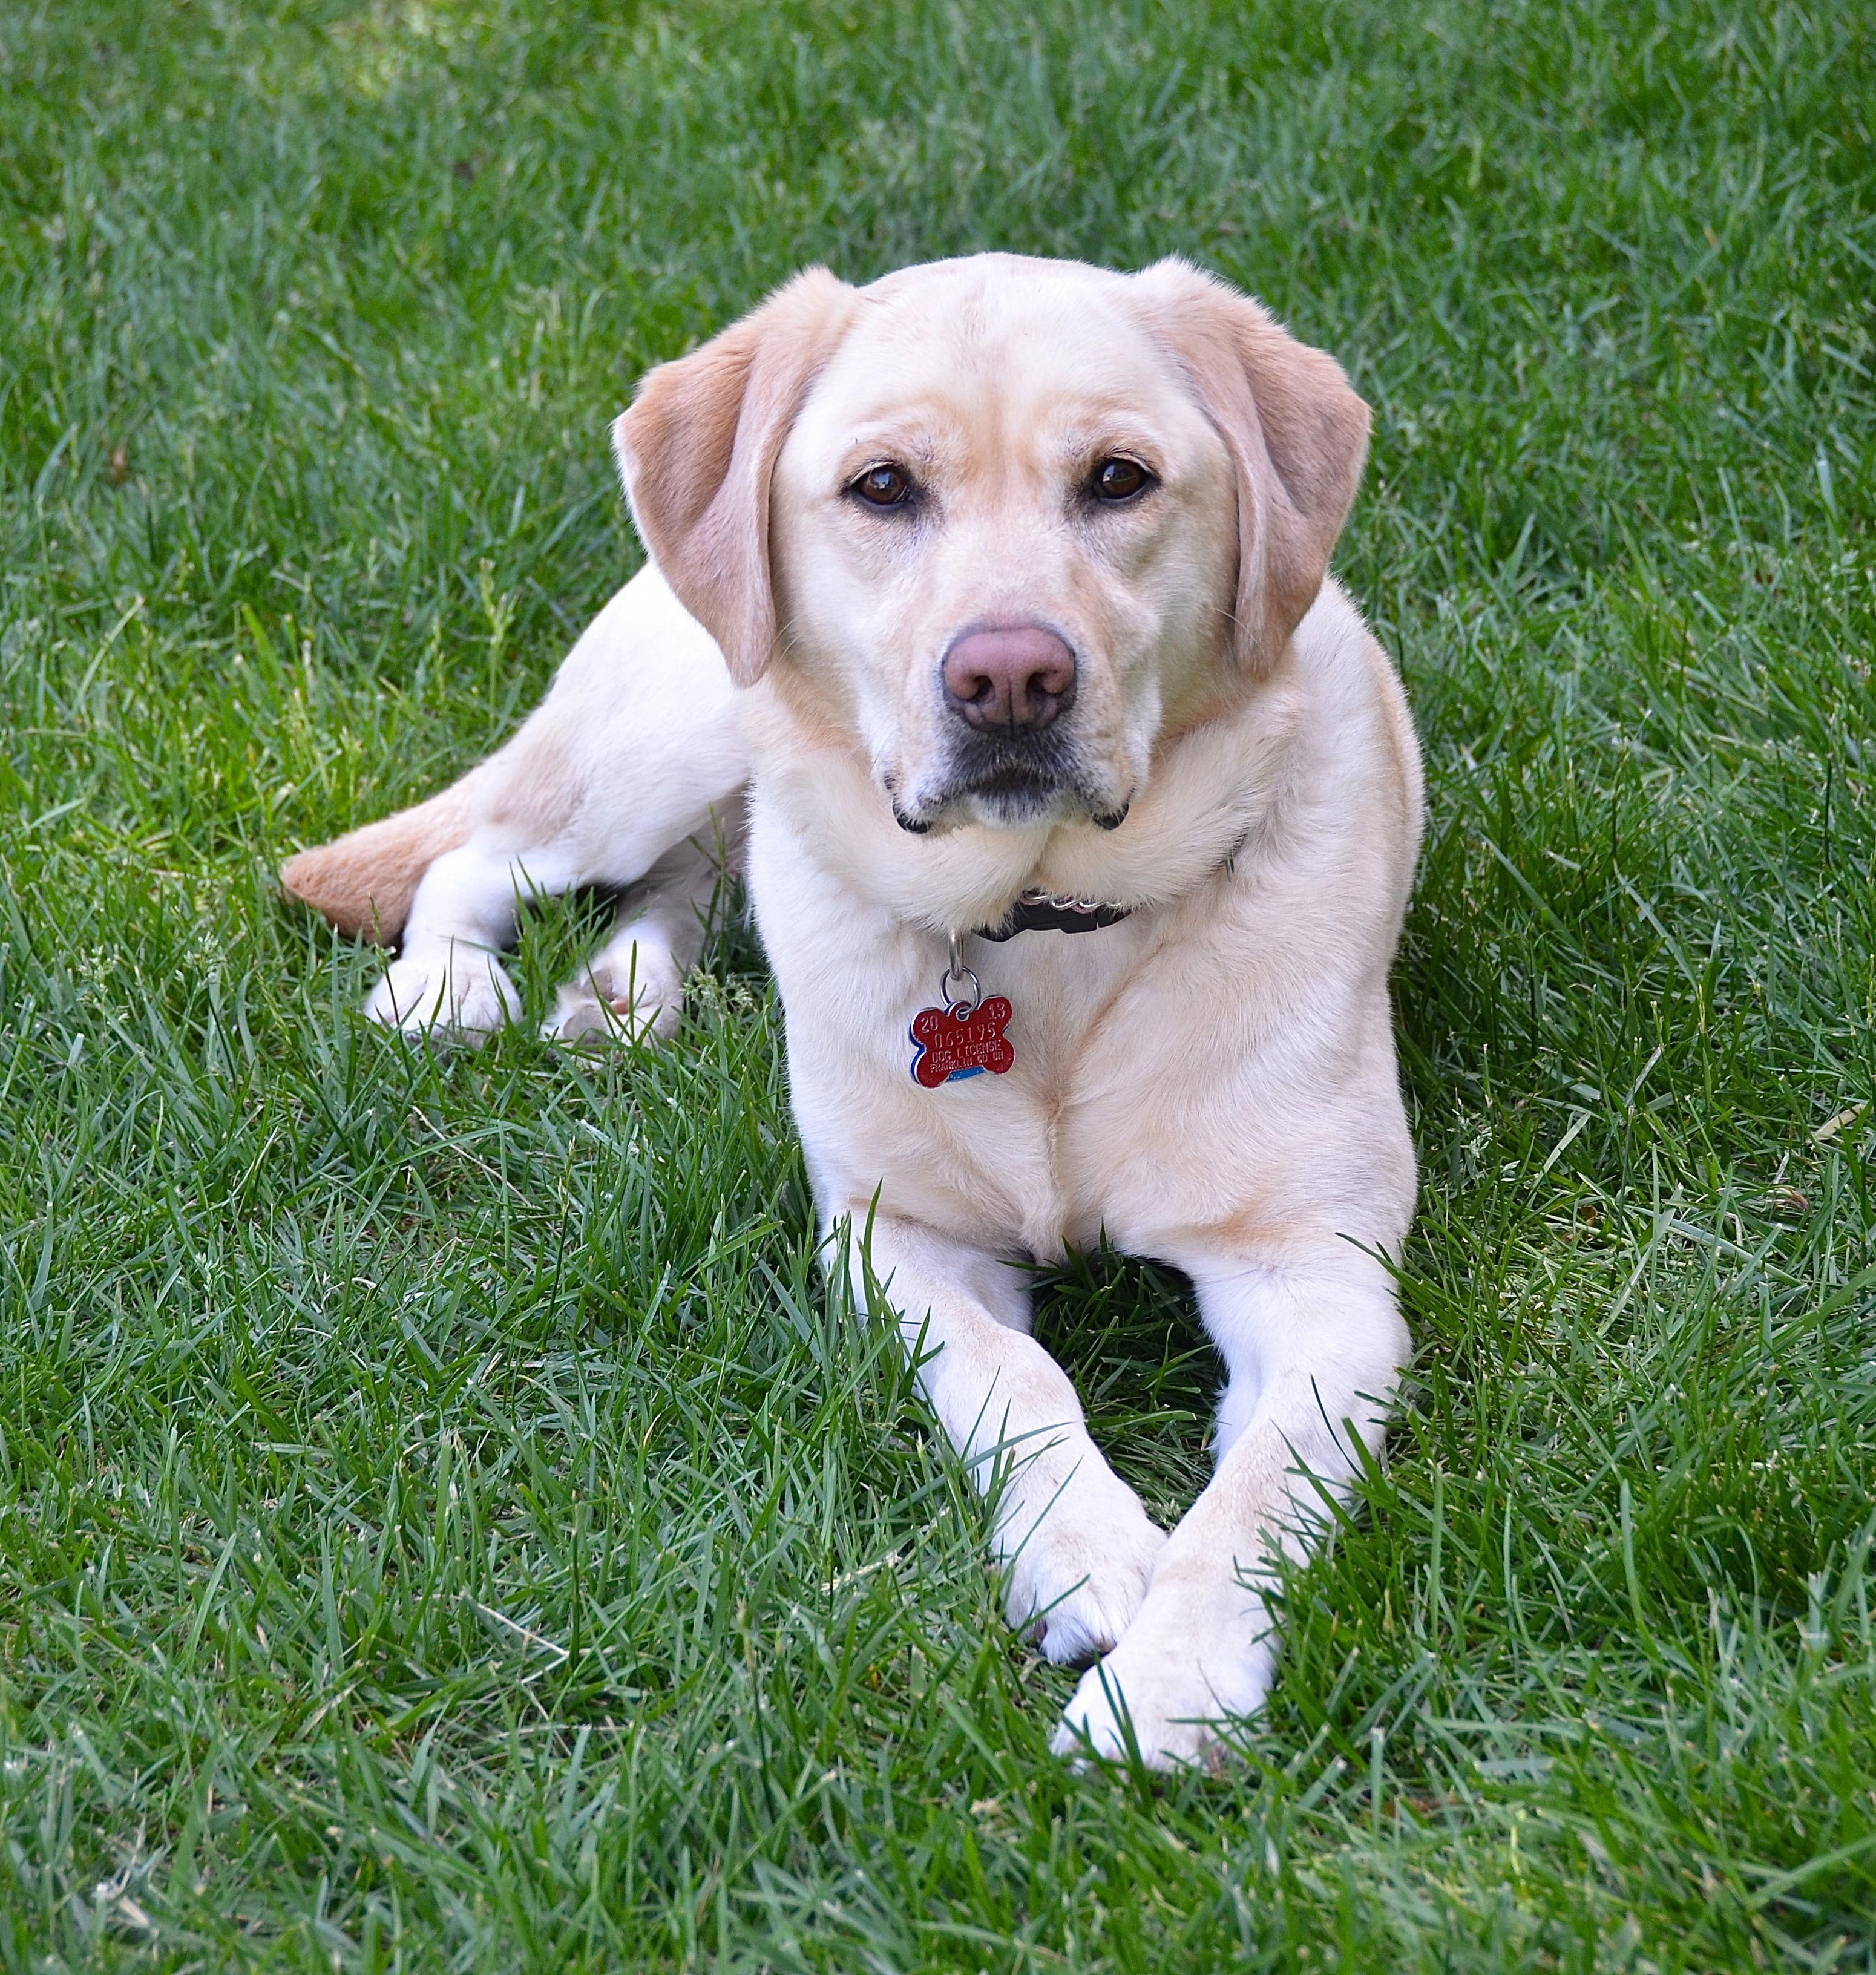 Labrador Lovers Labrador Love Instagram Posts Videos Stories On Webstaqram Com Labrador Retriever Lab Dogs Labrador